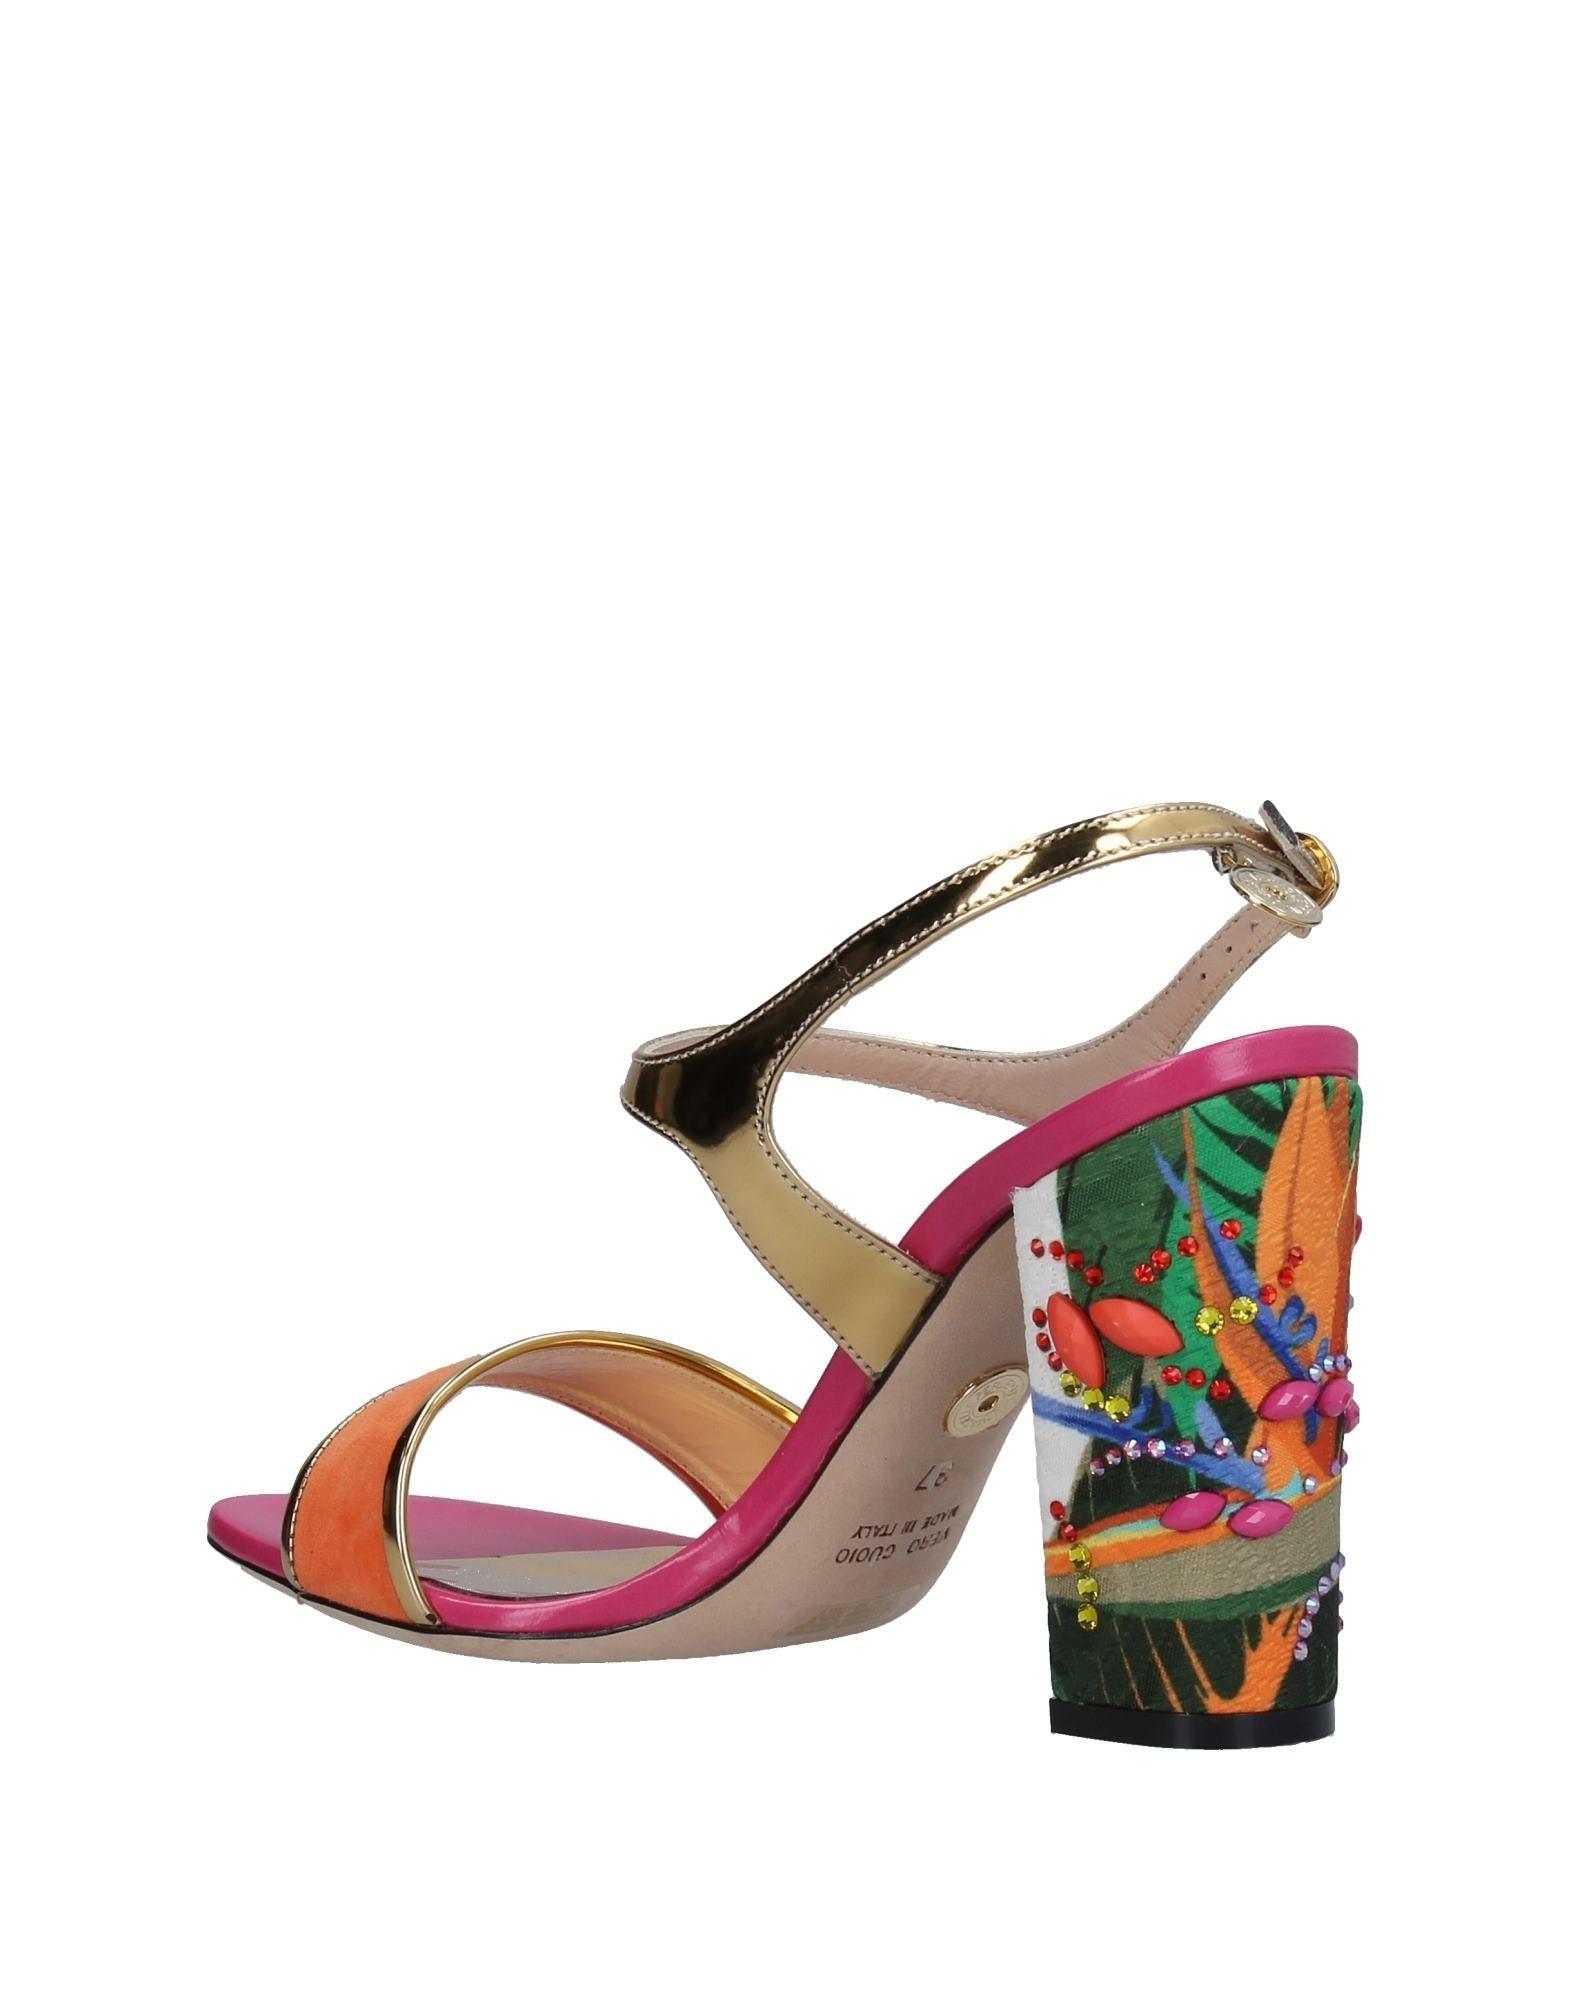 ... Sandales Vdp Collection Femme - Sandales Vdp Collection sur ...